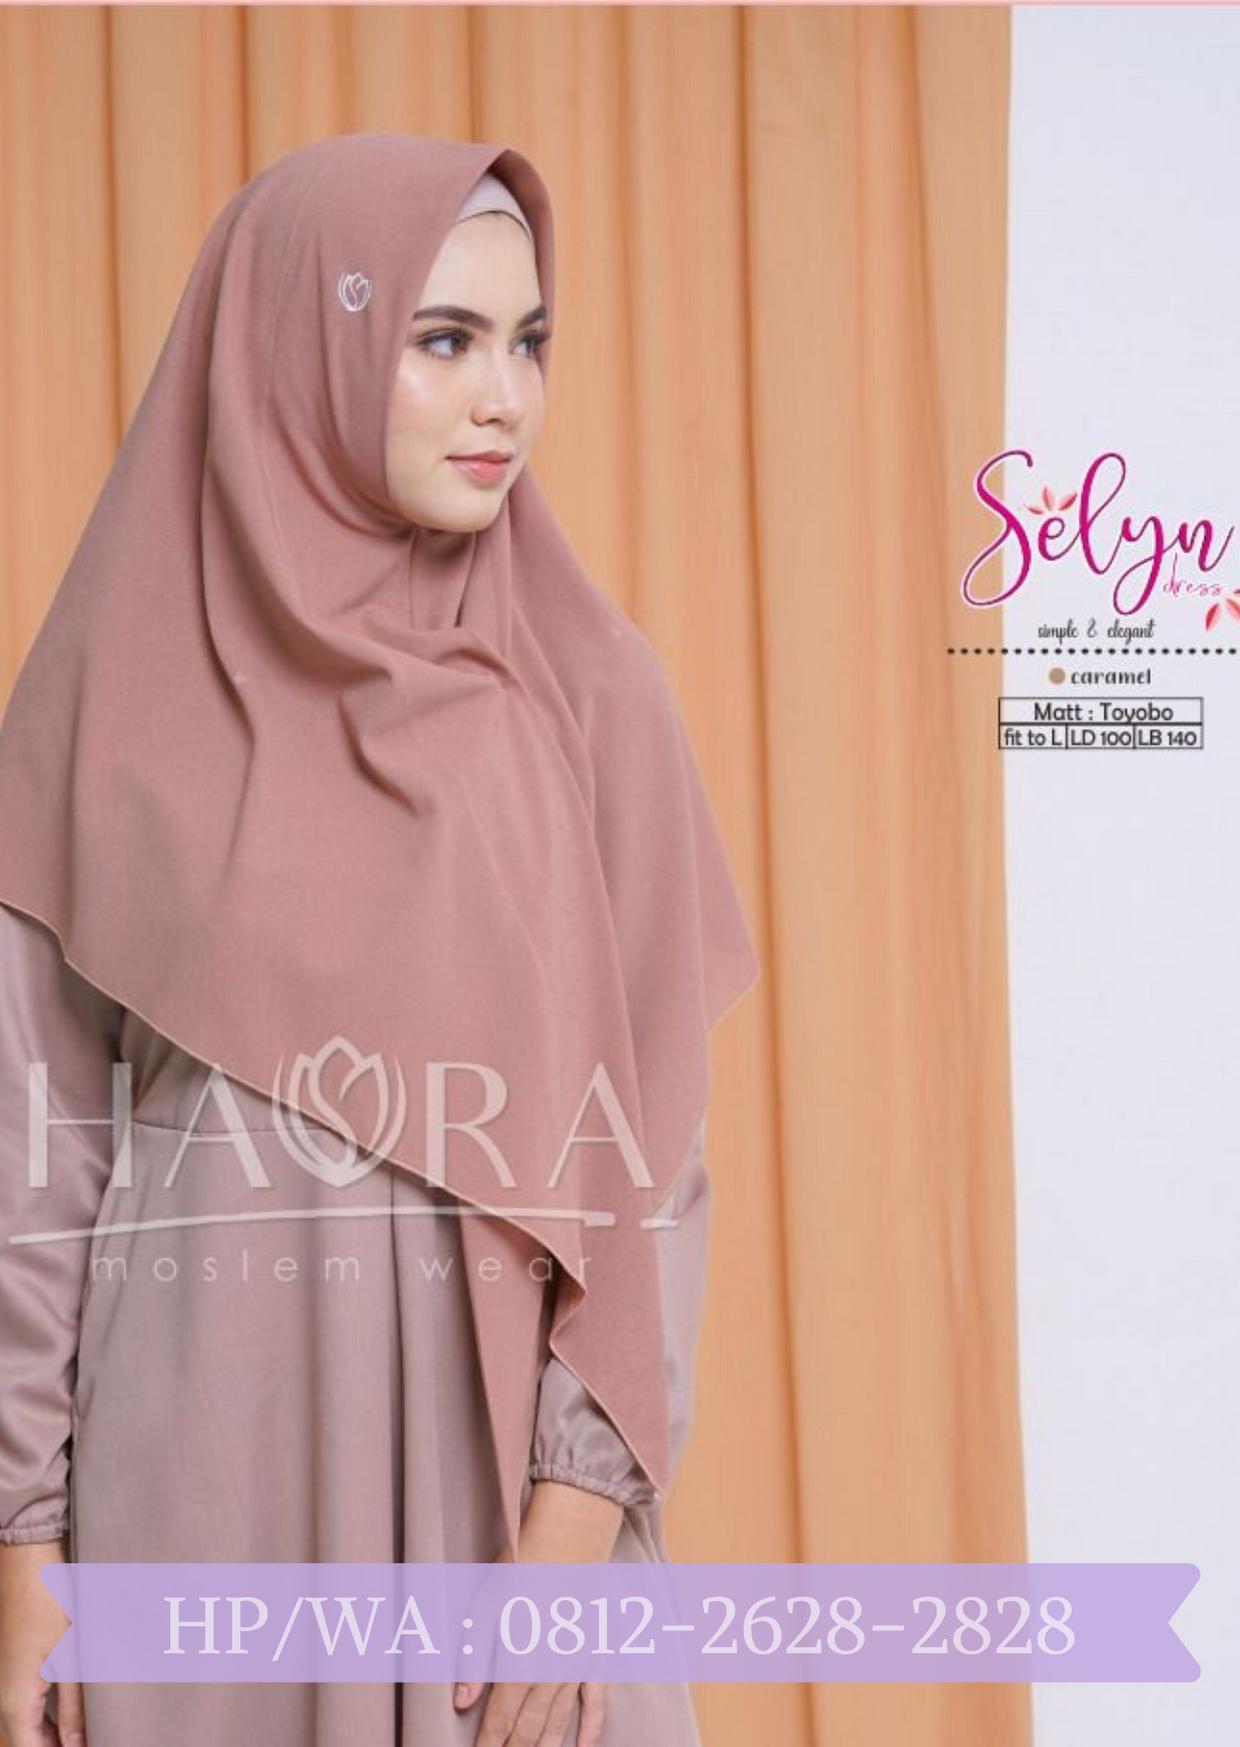 Produsen Gamis Tunik Hijab Kota Tegal Grosir Kaftan Baju Lebaran Khimar Kota Tegal Fashion Hijab Magelang